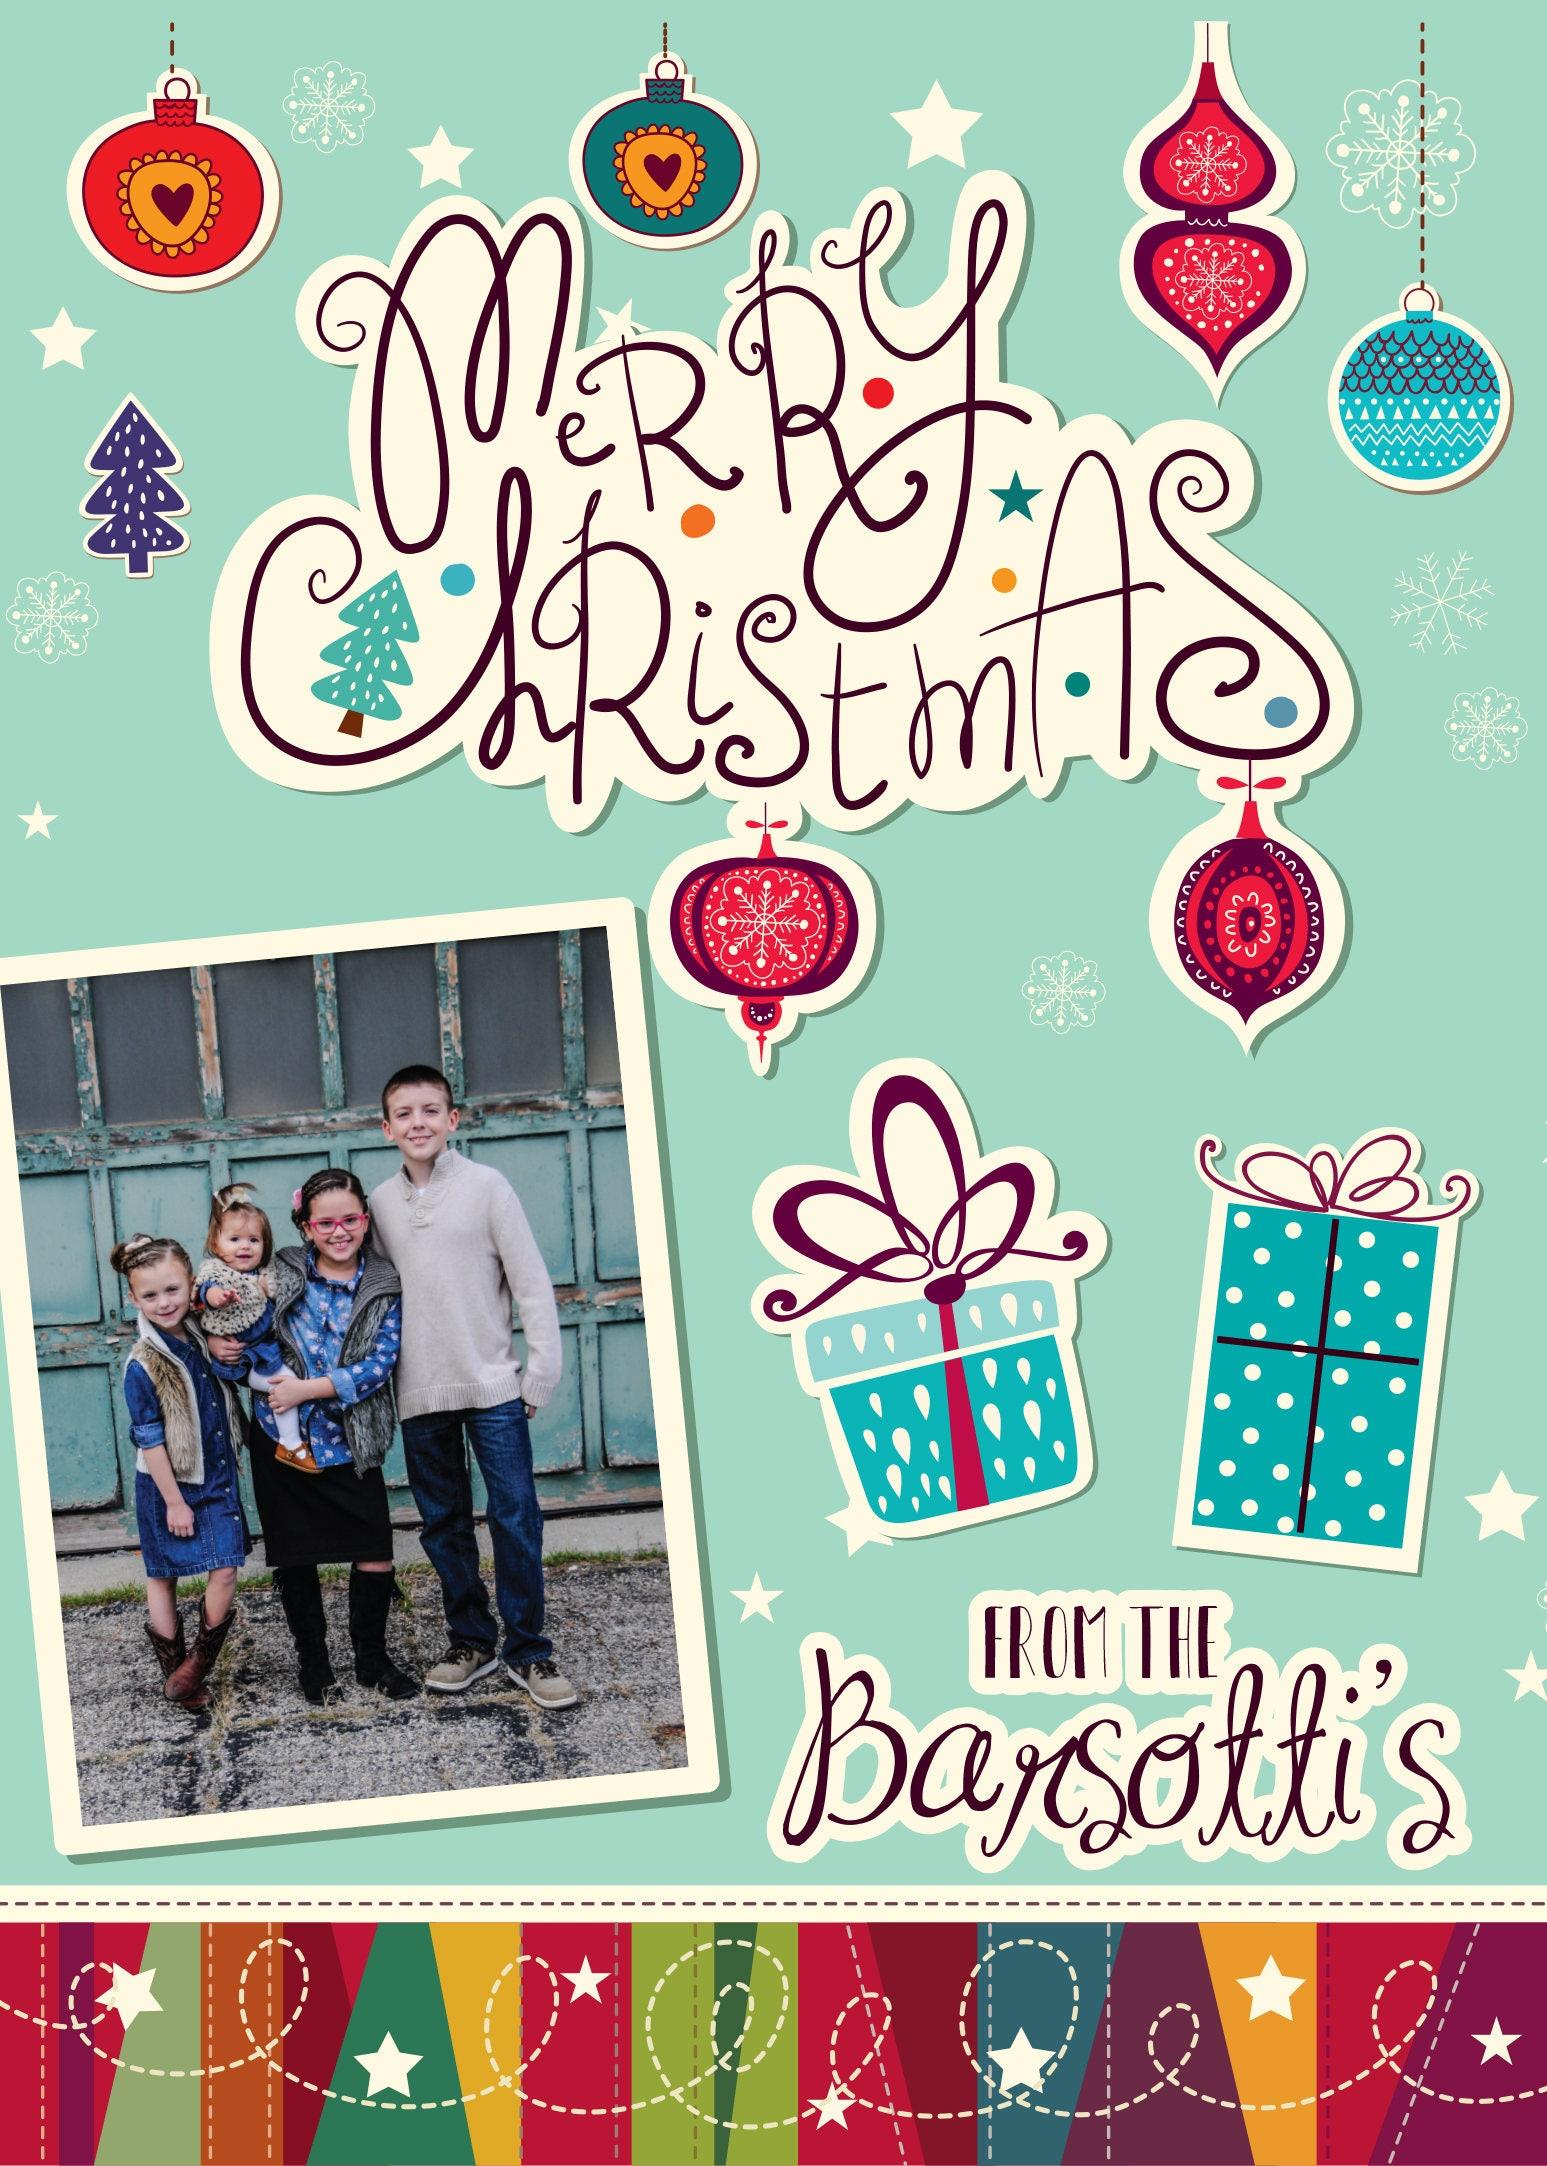 family christmas card photo christmas cards our first christmas personalized christmas cards holiday cards photo picture custom cards - Custom Photo Christmas Cards